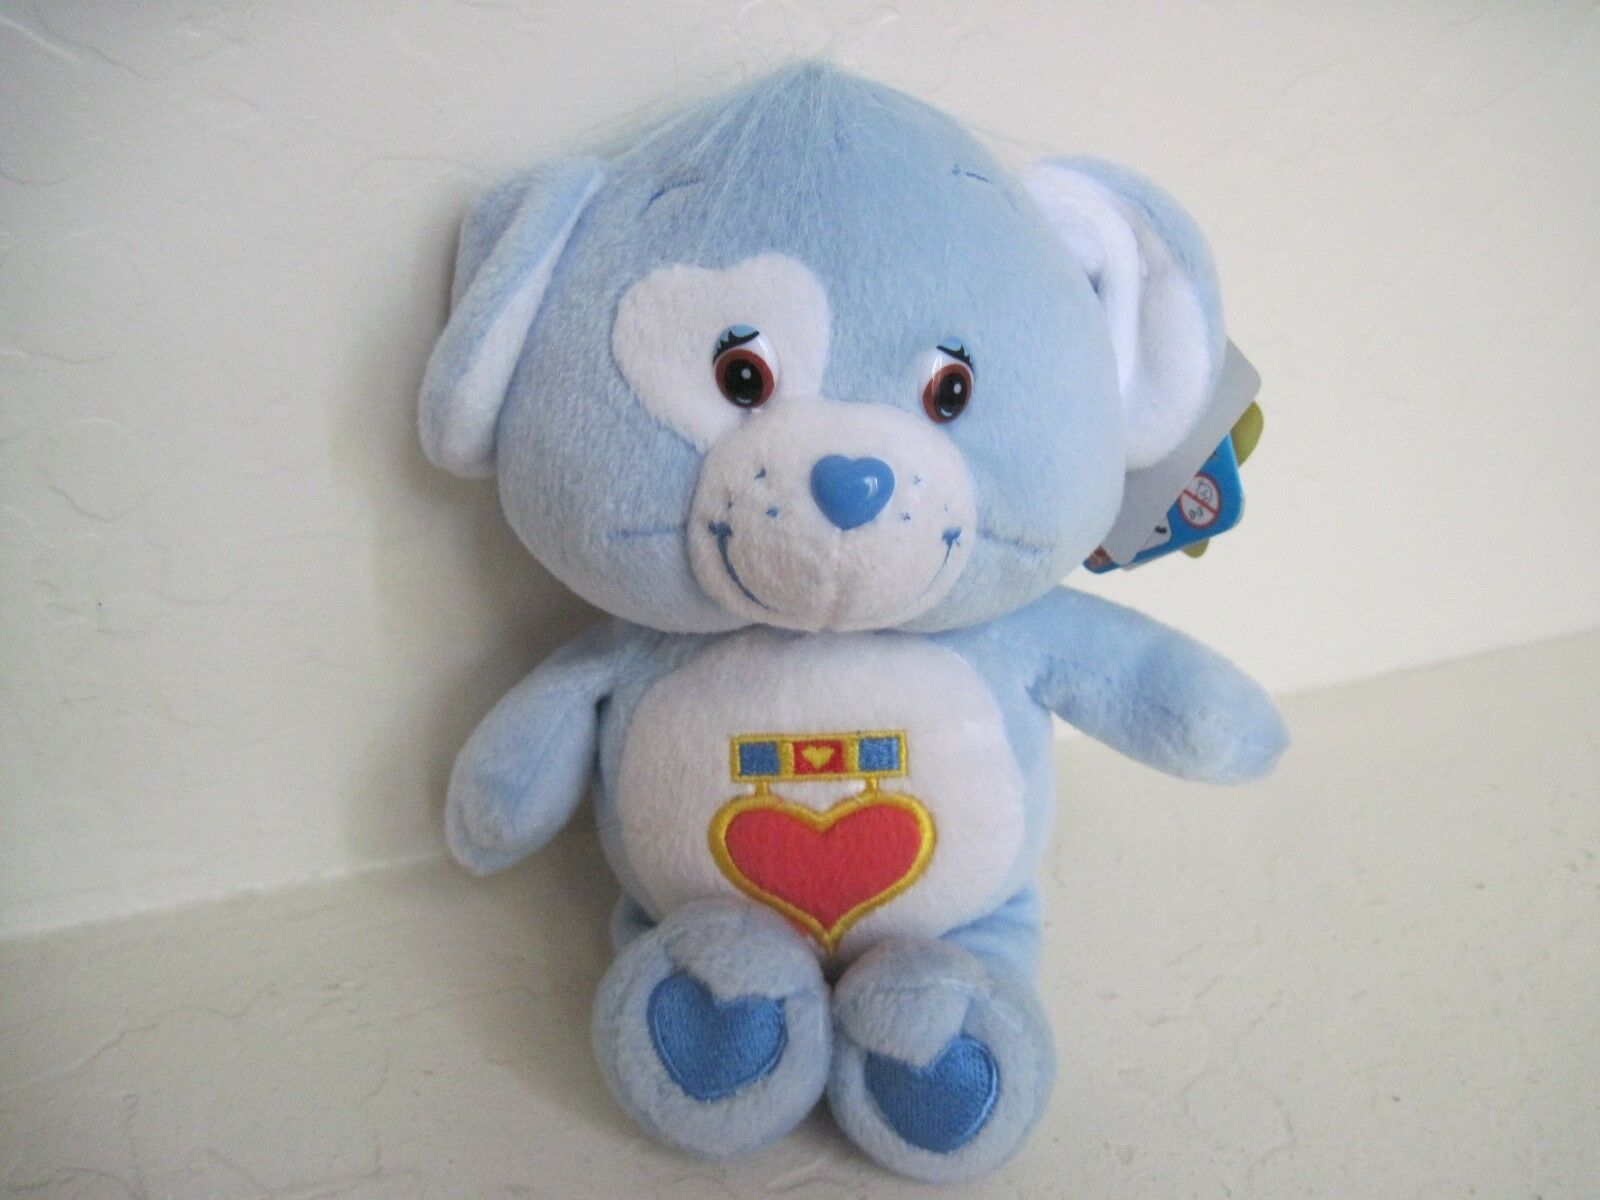 neal sofaworks teddy american made chesterfield sofa care bear cousins loyal heart dog 9 plush light stuffed animal blau 82044e